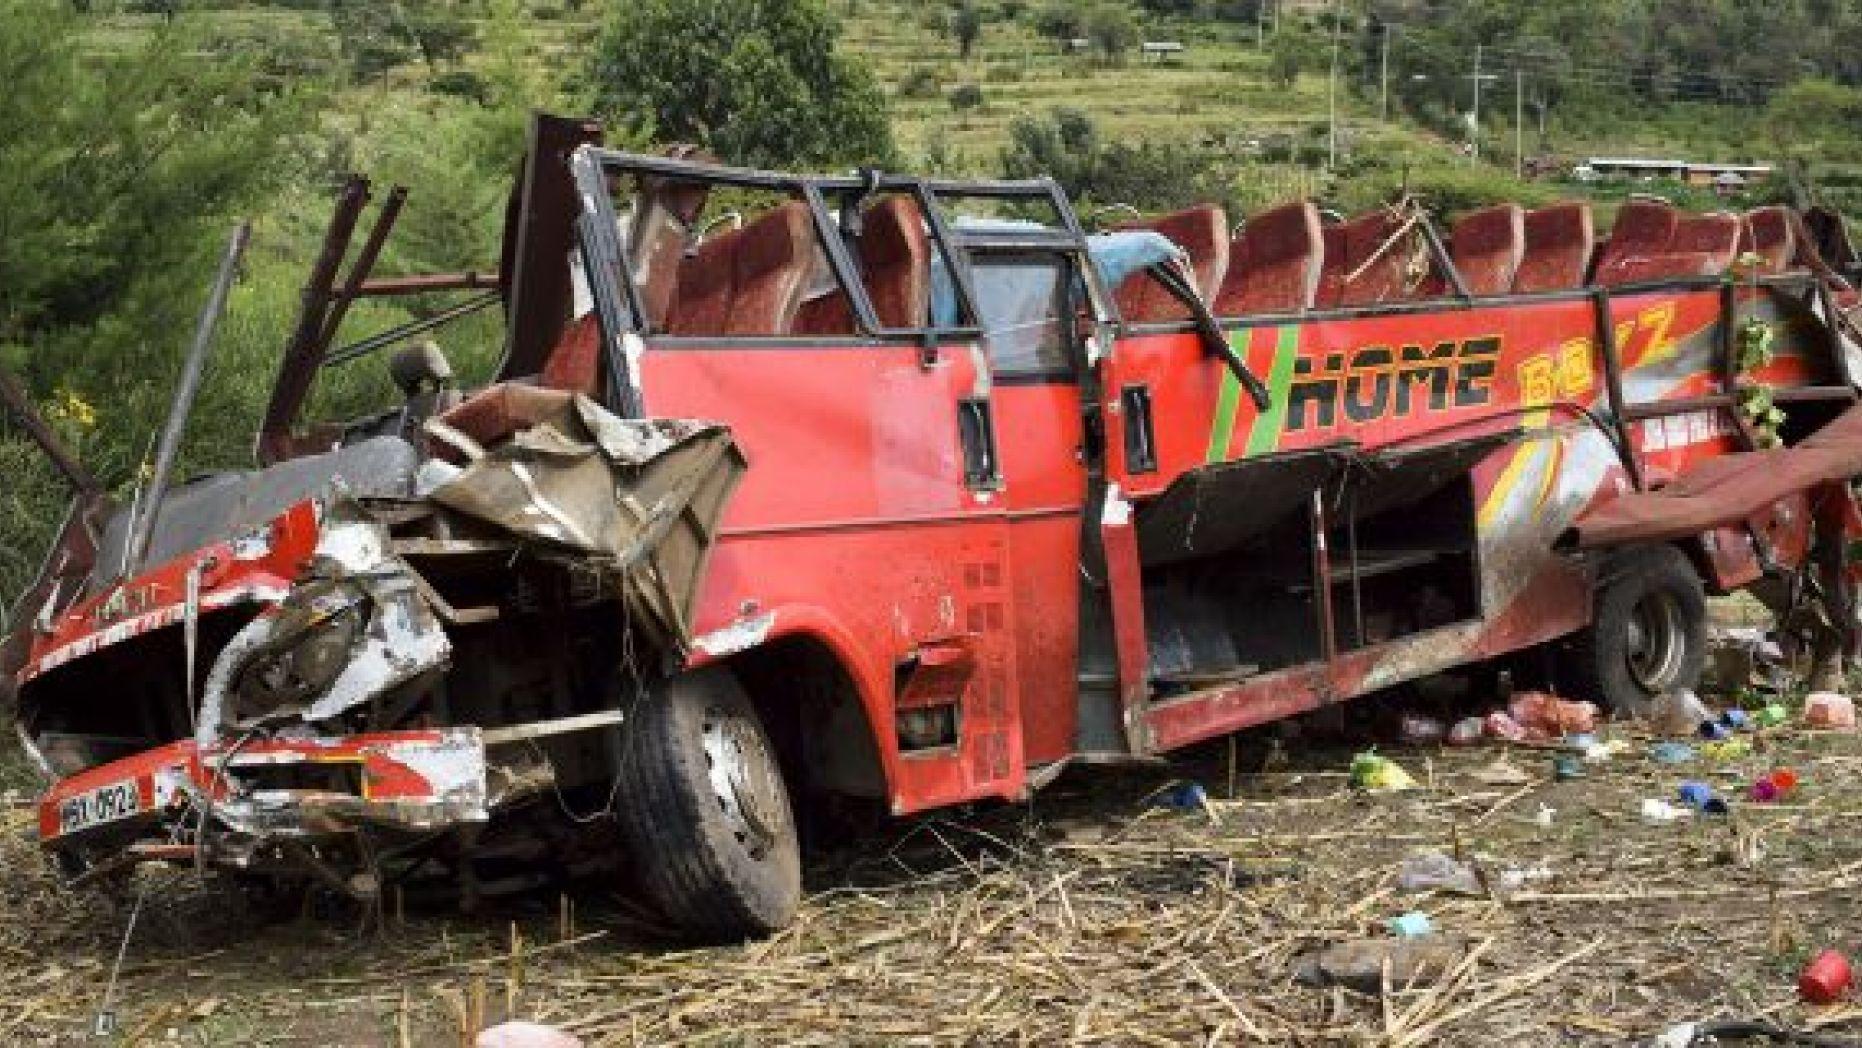 50 People Dead In Bus Crash In Western Kenya NEWSCABAL